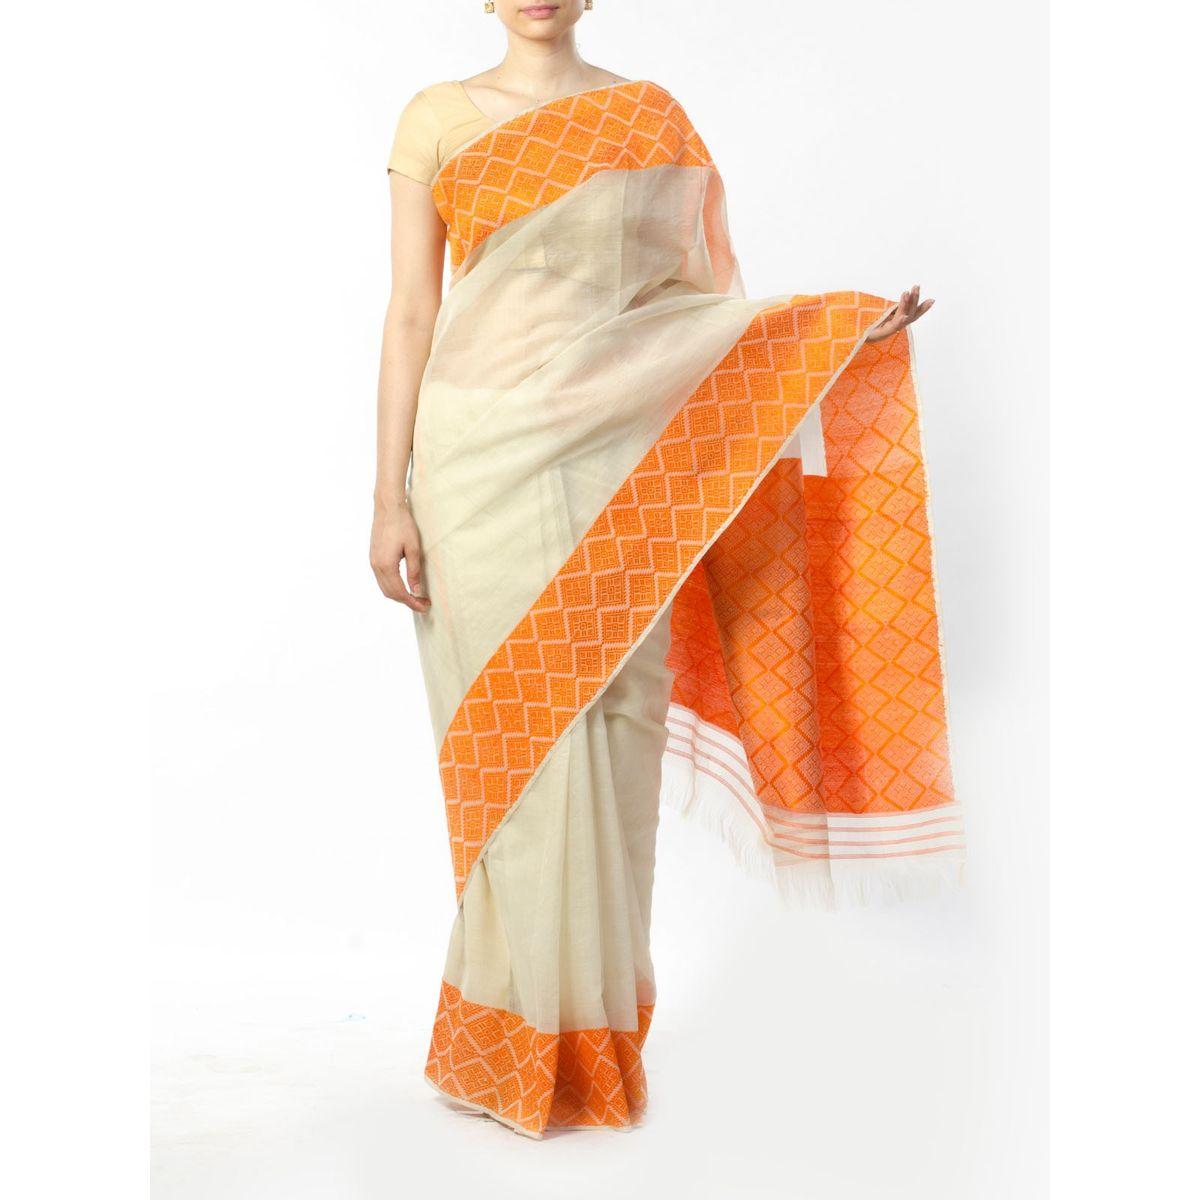 Off-White Muga Silk Saree with Orange Border